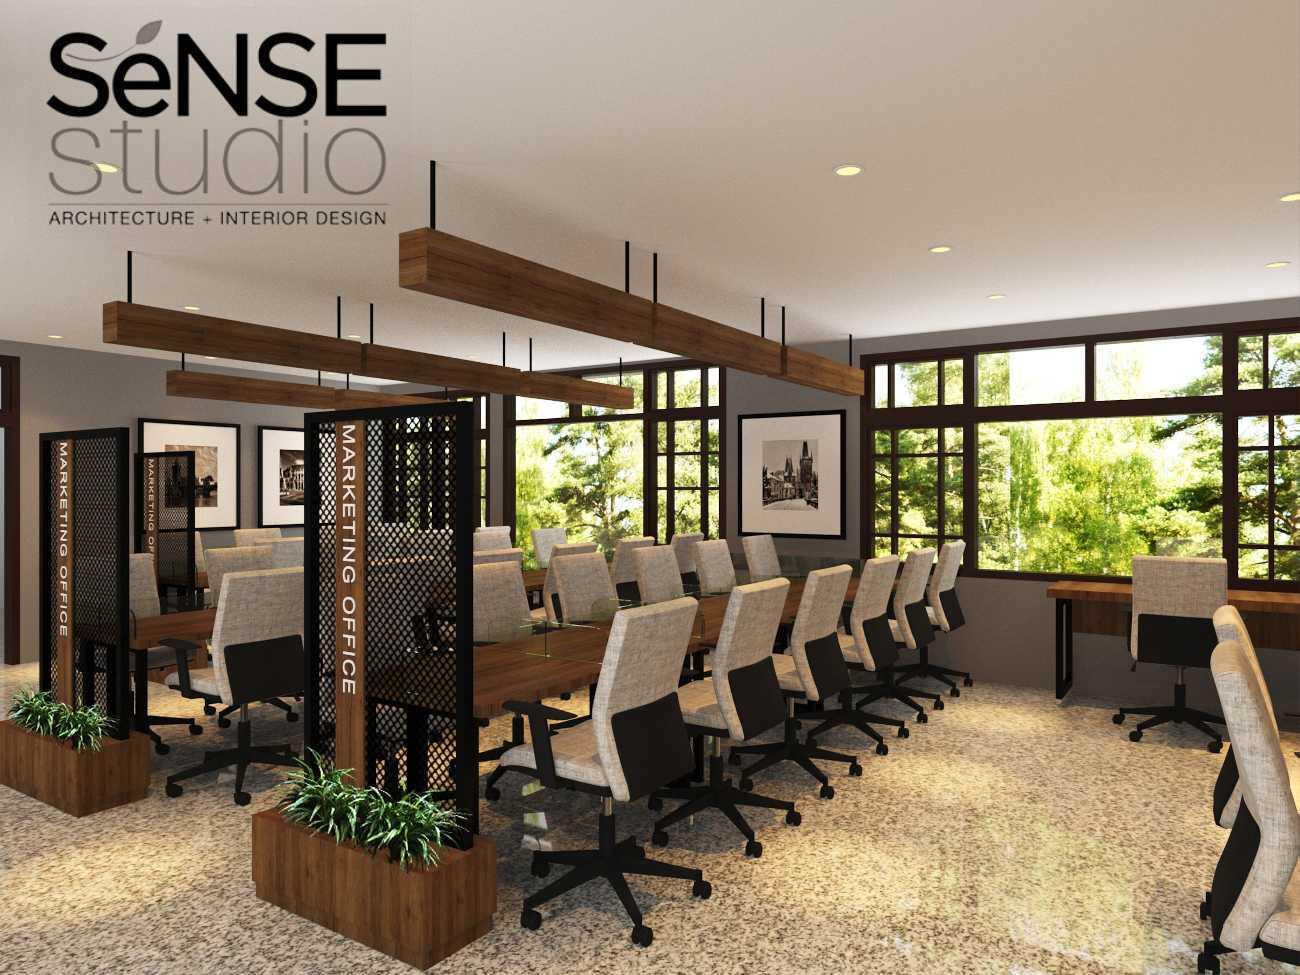 Sense Isle Studio Office Surabaya Surabaya, Kota Sby, Jawa Timur, Indonesia Surabaya, Kota Sby, Jawa Timur, Indonesia Sense-Studio-Office-Surabaya  80420